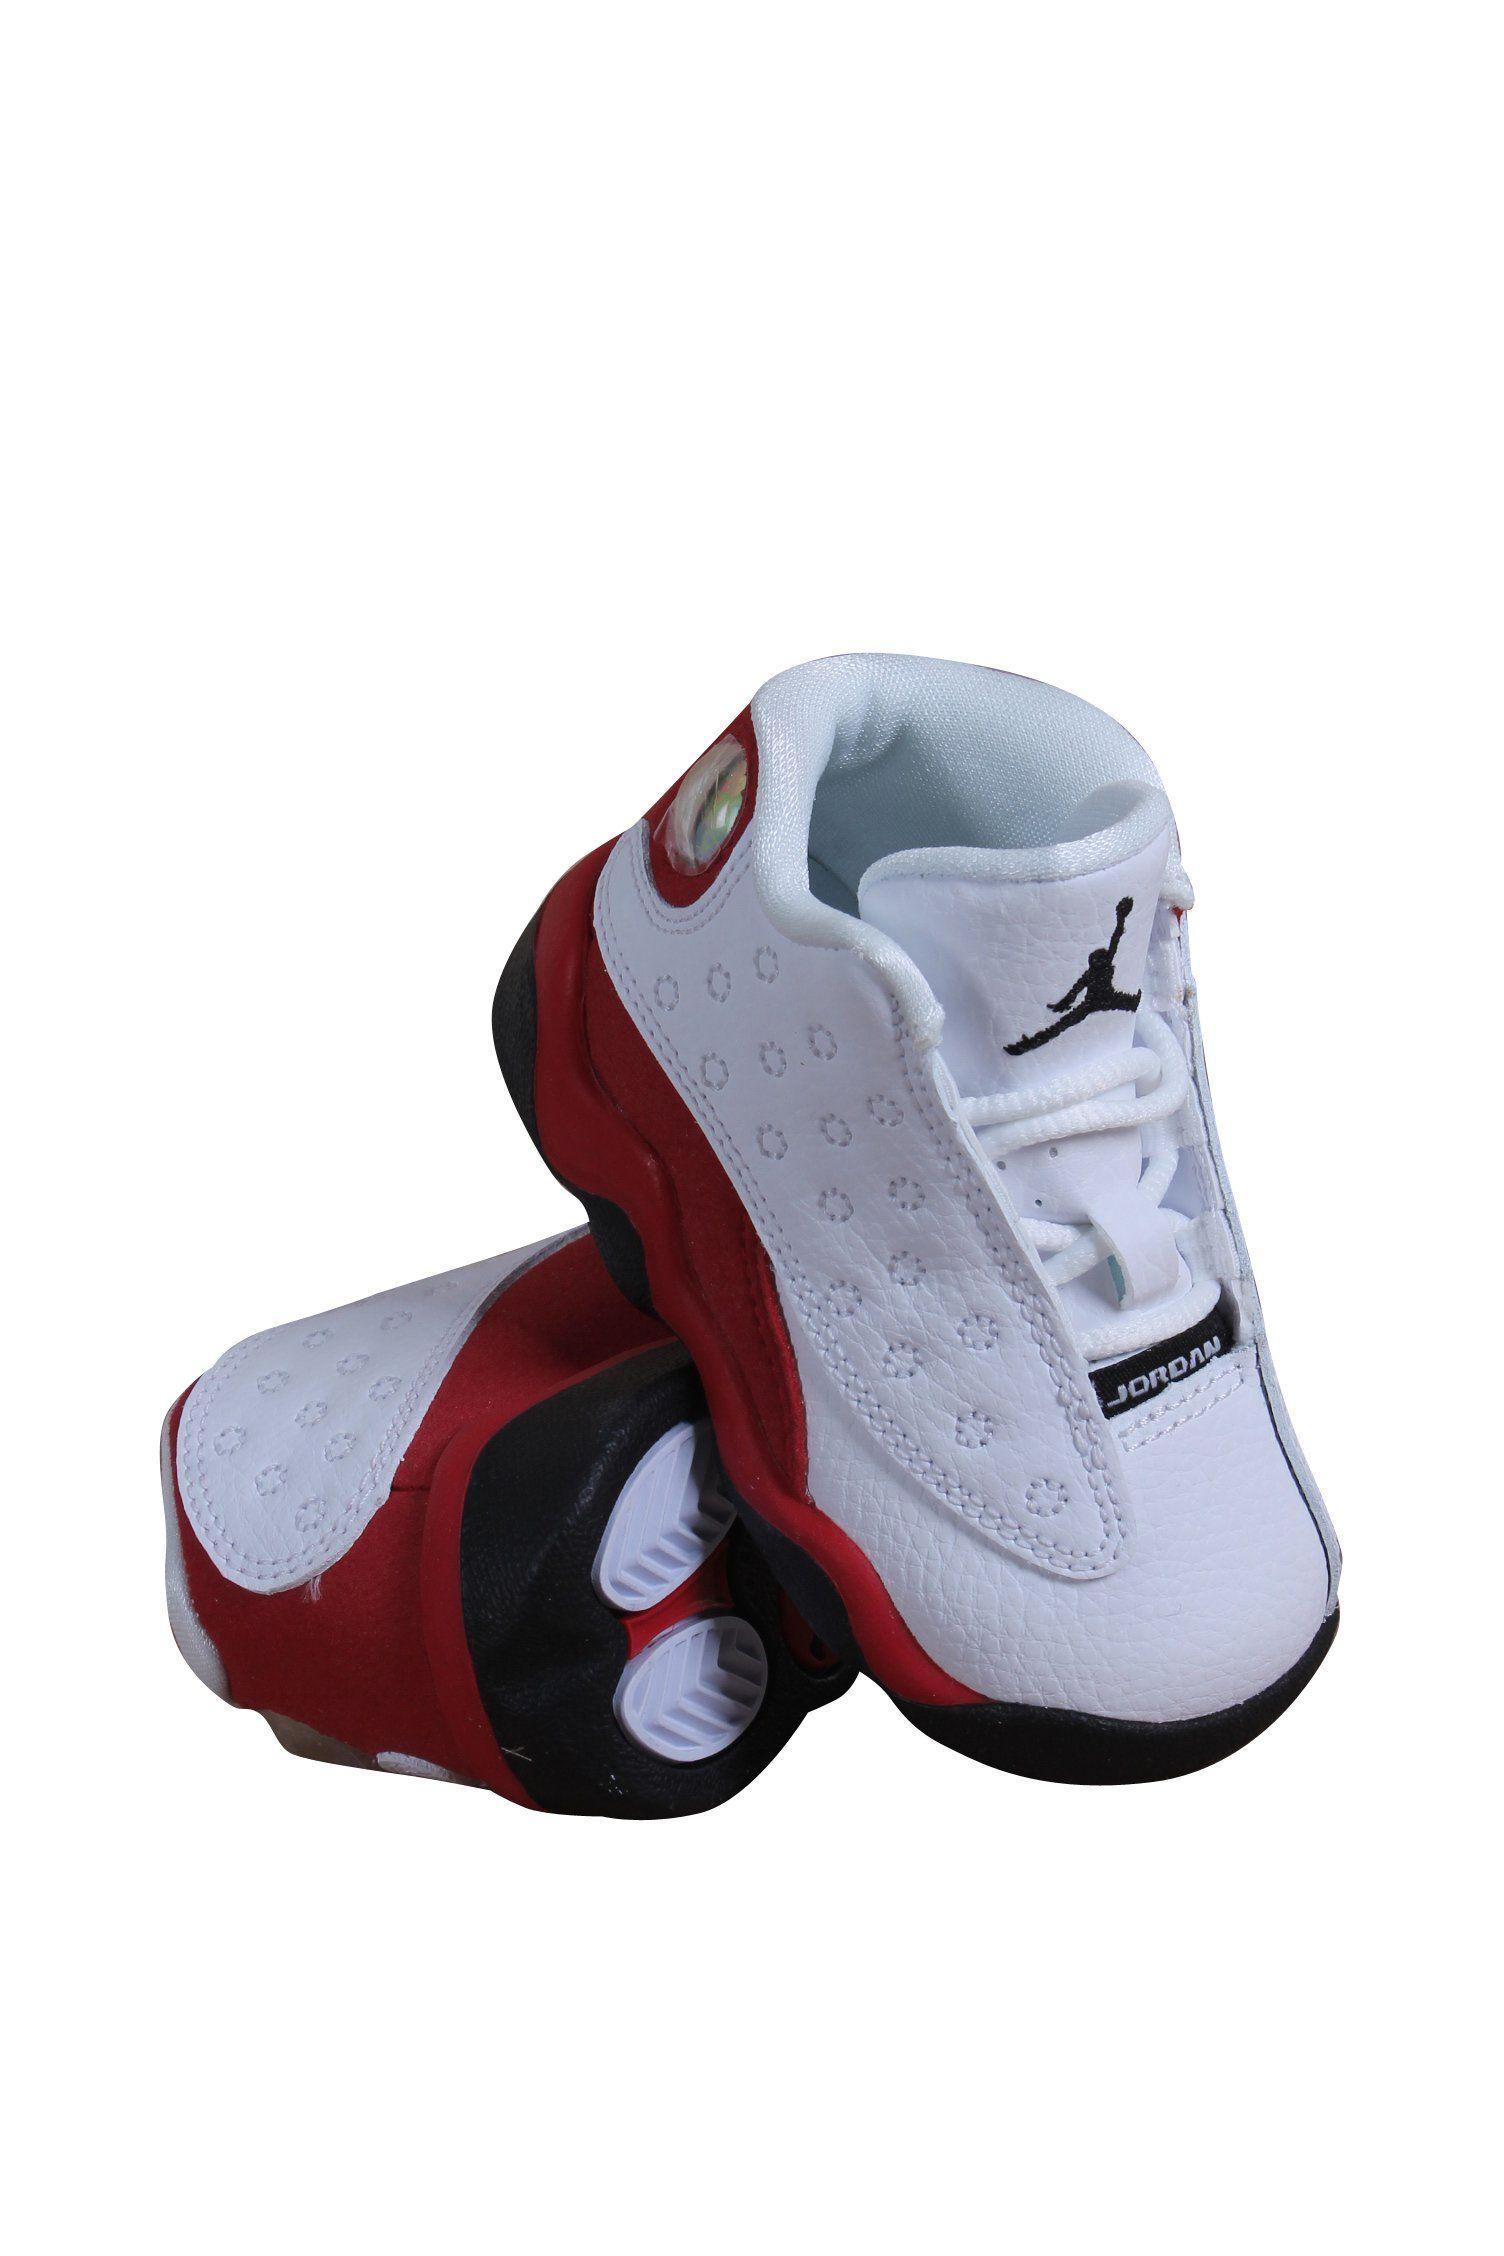 fef2cc51c9d1 Jordan 414581-122 Air Jordan Retro 13 OG Mid Infant Toddler